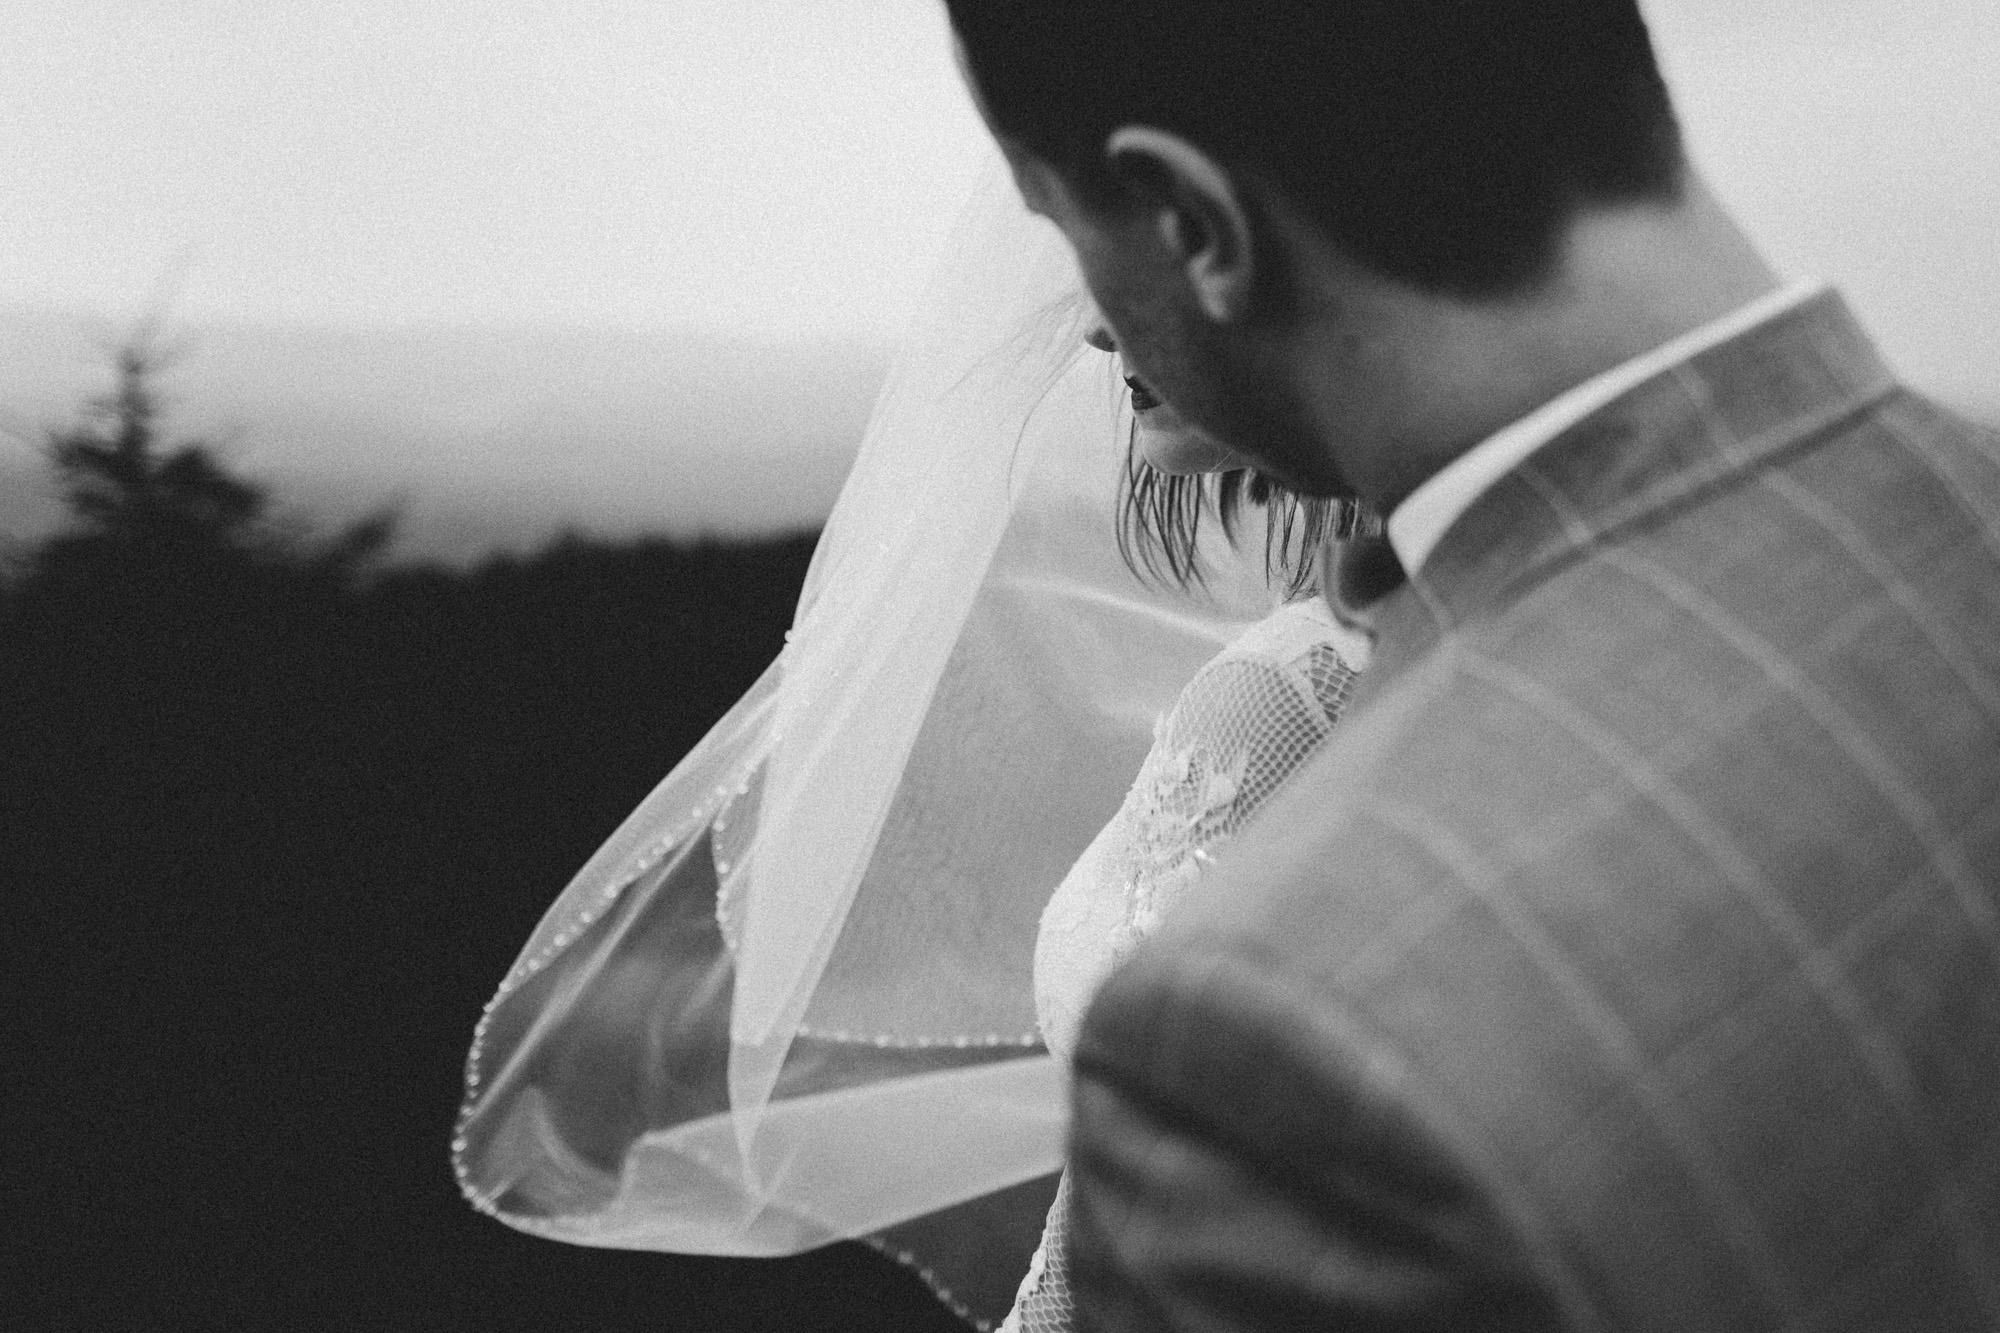 DanielaMarquardtPhotography_Hochzeitsfotograf_Düsseldorf_Köln_Mallorca_Bayern_Austria_Harz_LinaundMaik_Afterwedding-Shooting_Weddingphotographer_Ibiza_Tuskany_Italien_Toskana42